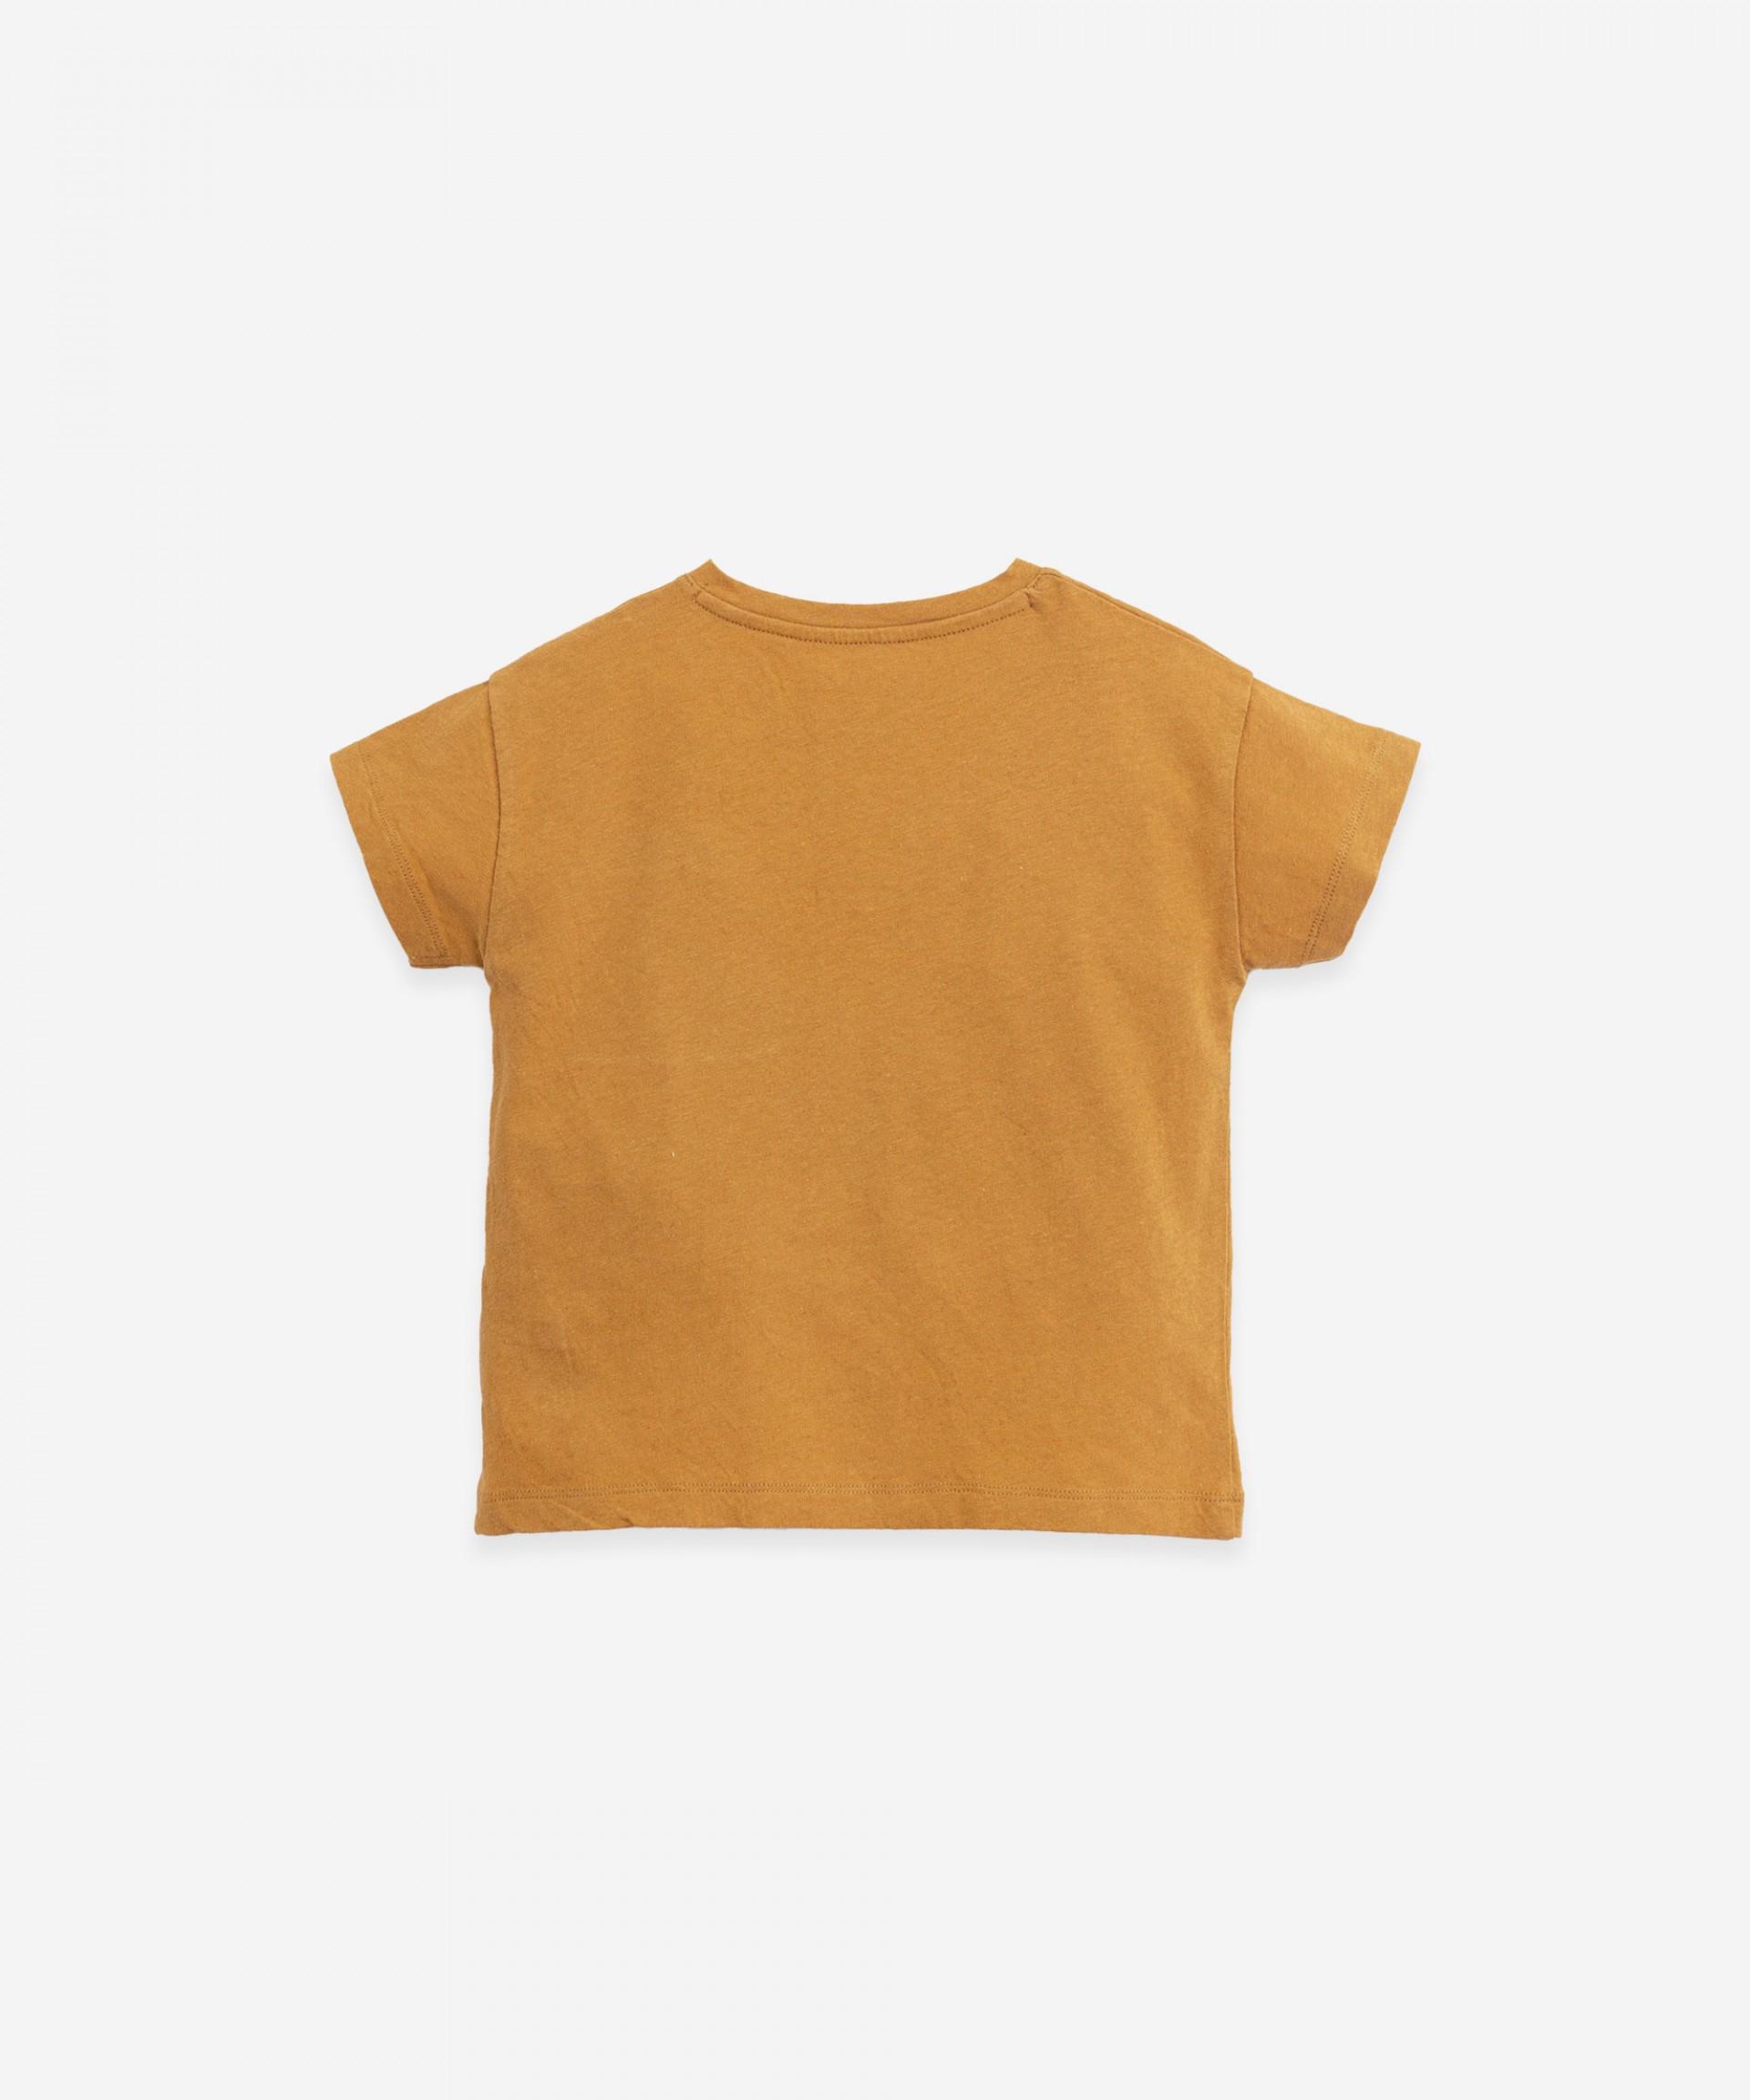 T-shirt con tasca | Botany